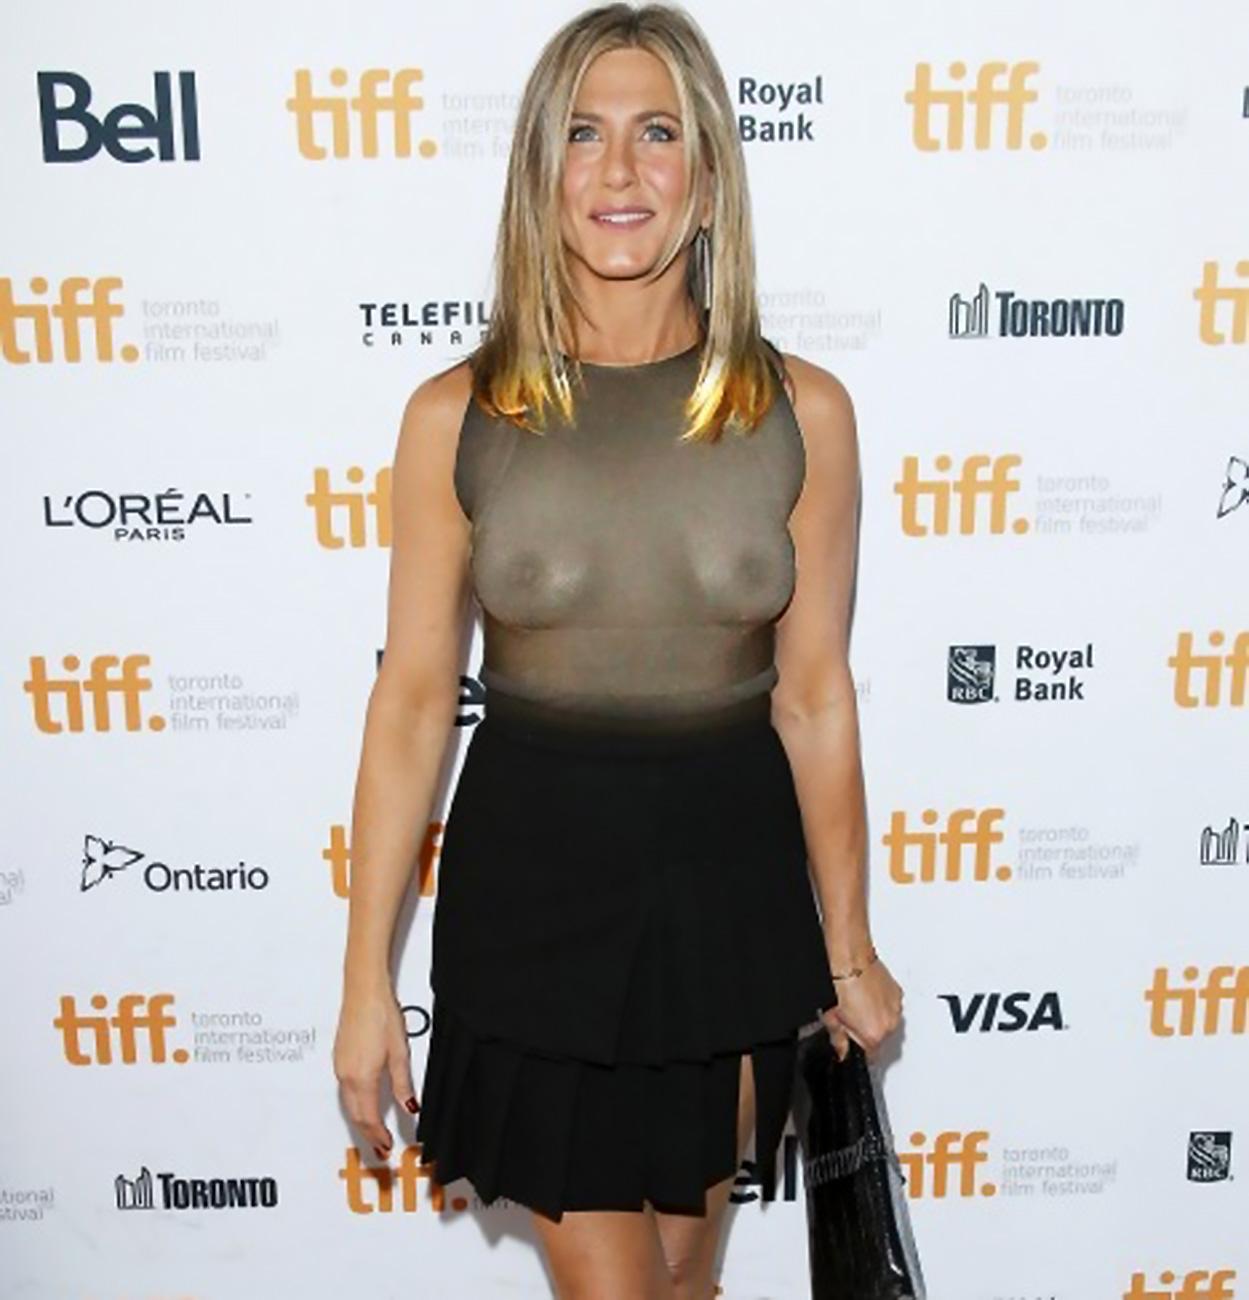 Jennifer aniston dons sexy black bra, gets fun and flirty with wanderlust co